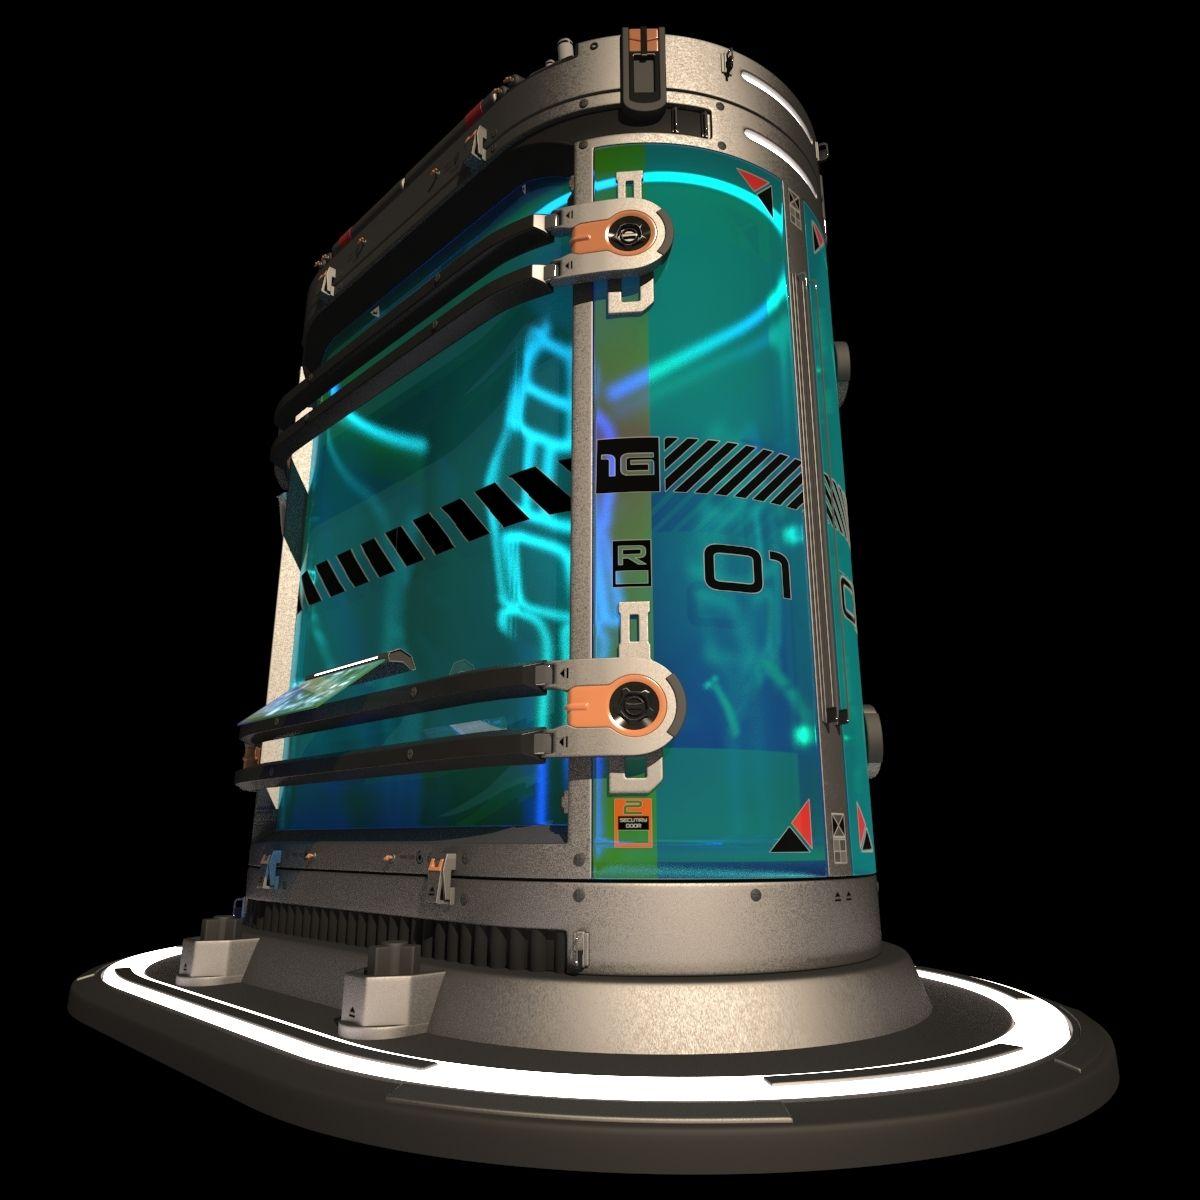 Scifi Cryopod Container 3d Model By Cermaka 3d Model Sci Fi Futuristic